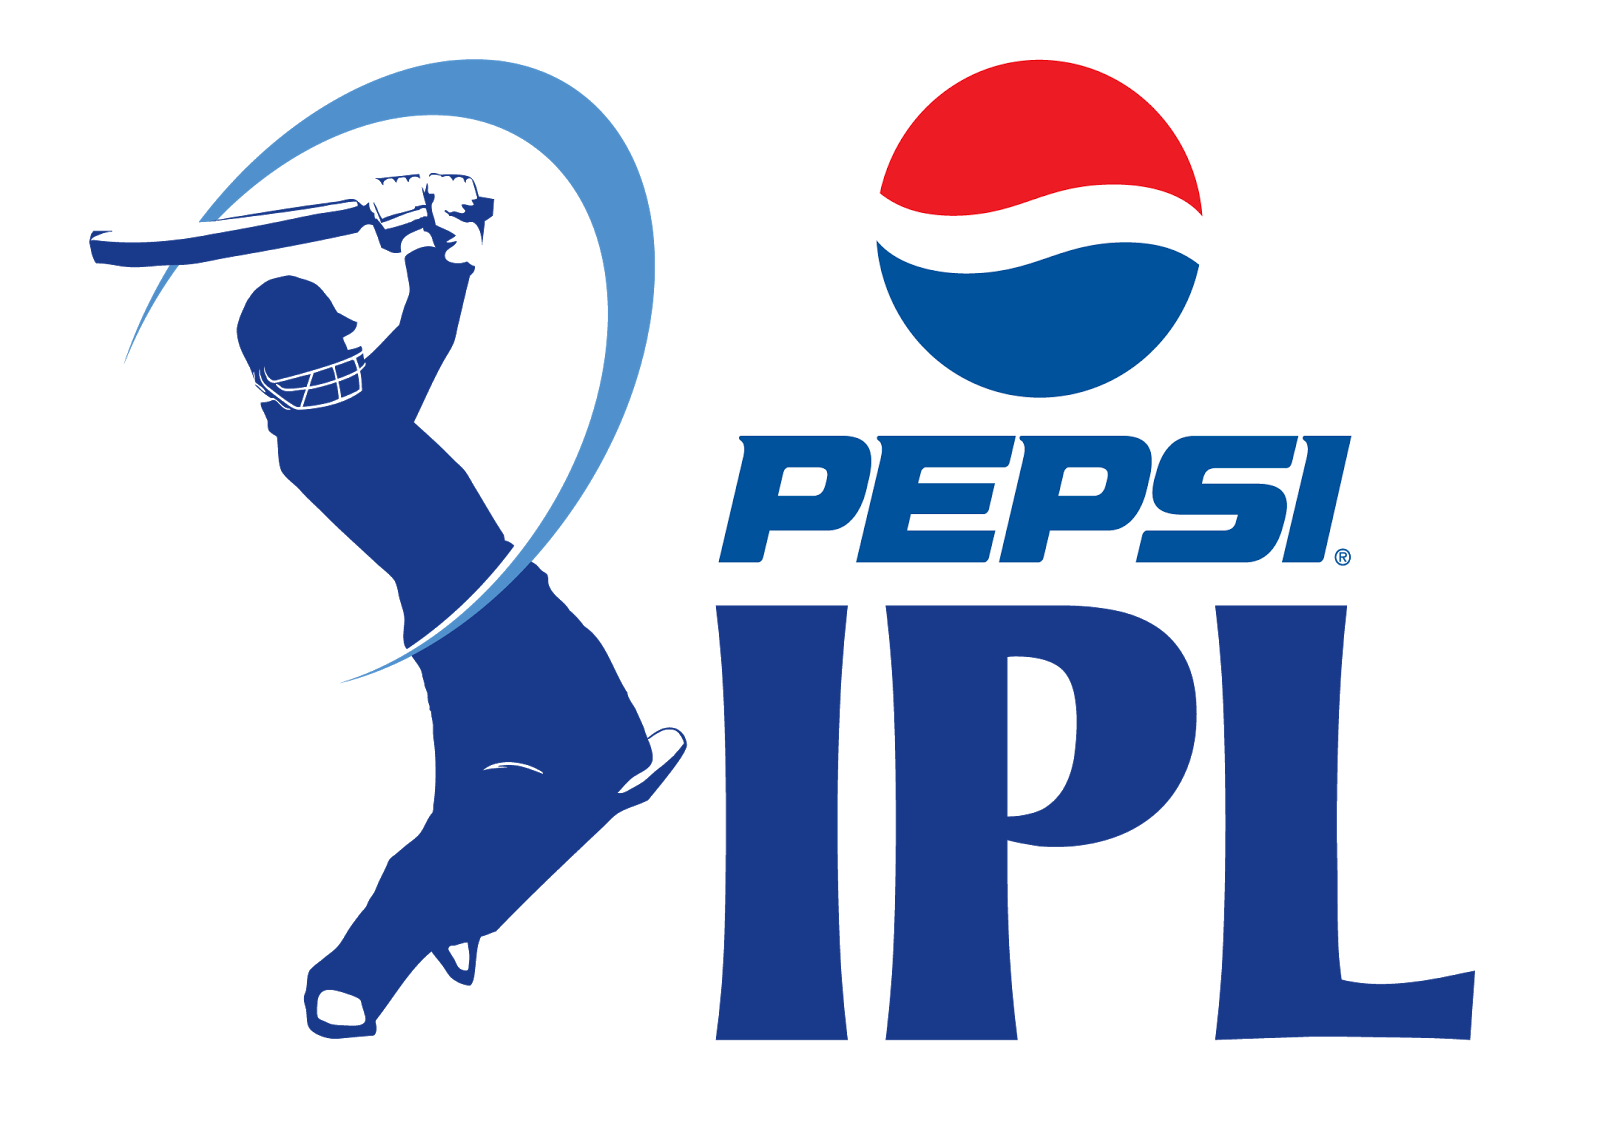 Pepsi IPL 6 Schedule - Pepsi Indian Premier League